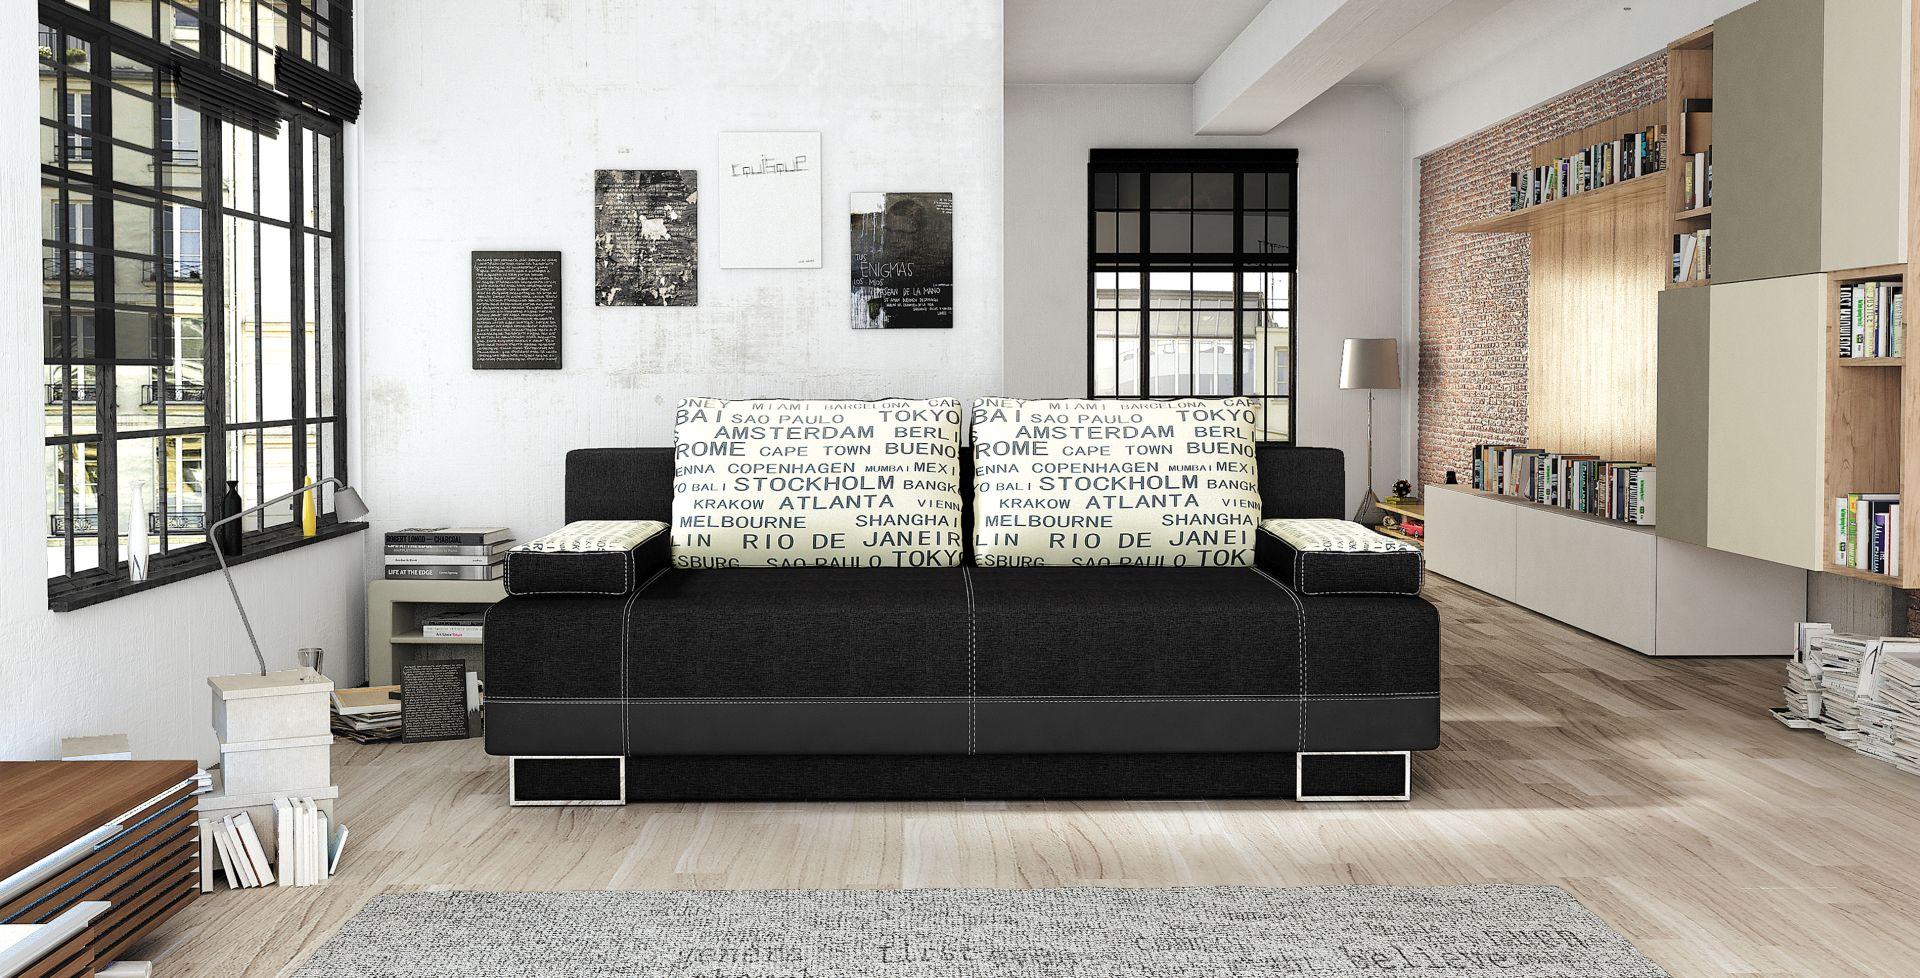 sofa schlafsofa designer 3 sitzer sofa mit bettfunktion bettkasten couch neu vegas www. Black Bedroom Furniture Sets. Home Design Ideas